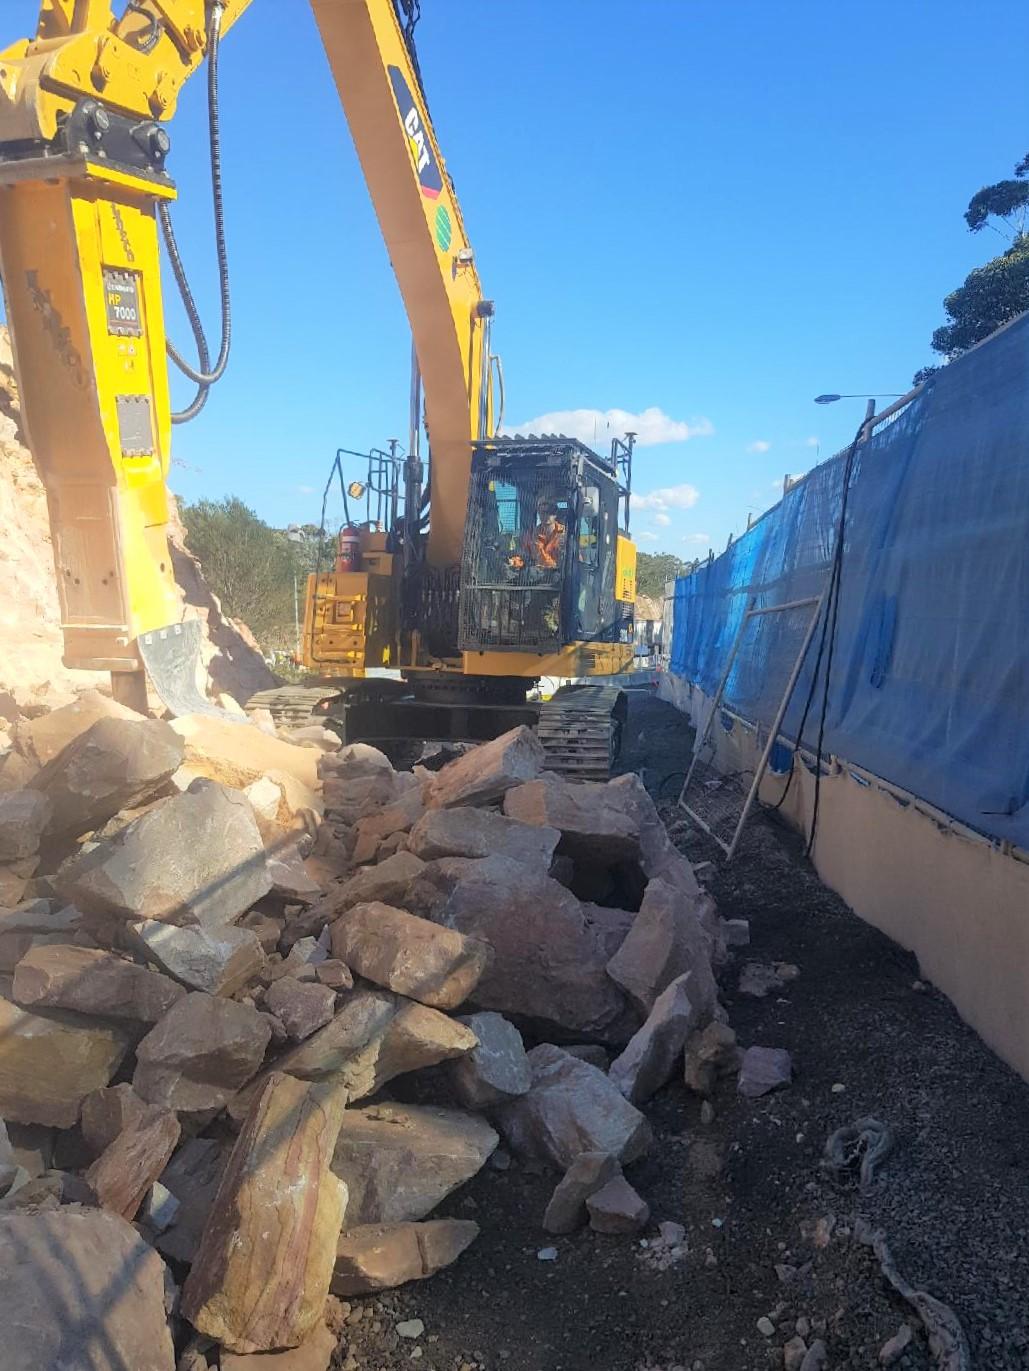 OCON Services Caterpillar excavator on site